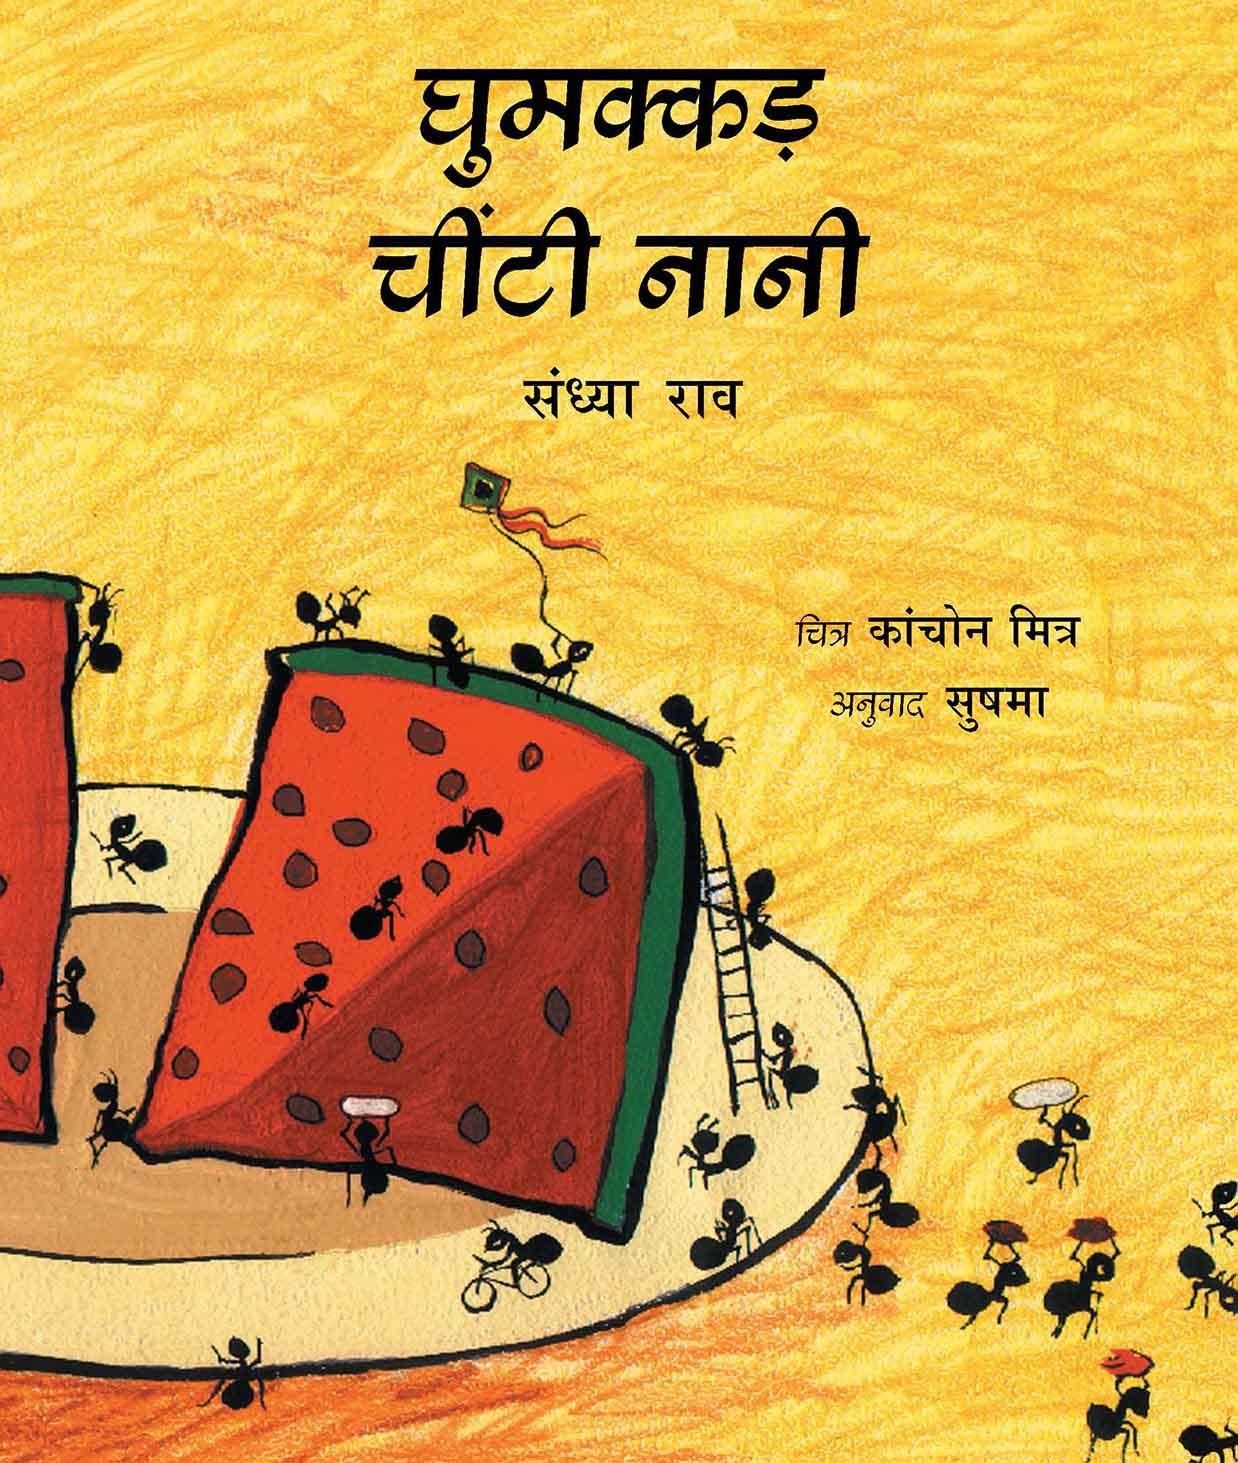 Busy Busy Grand-Ant/Ghumakkad Chinti Naani (Hindi)